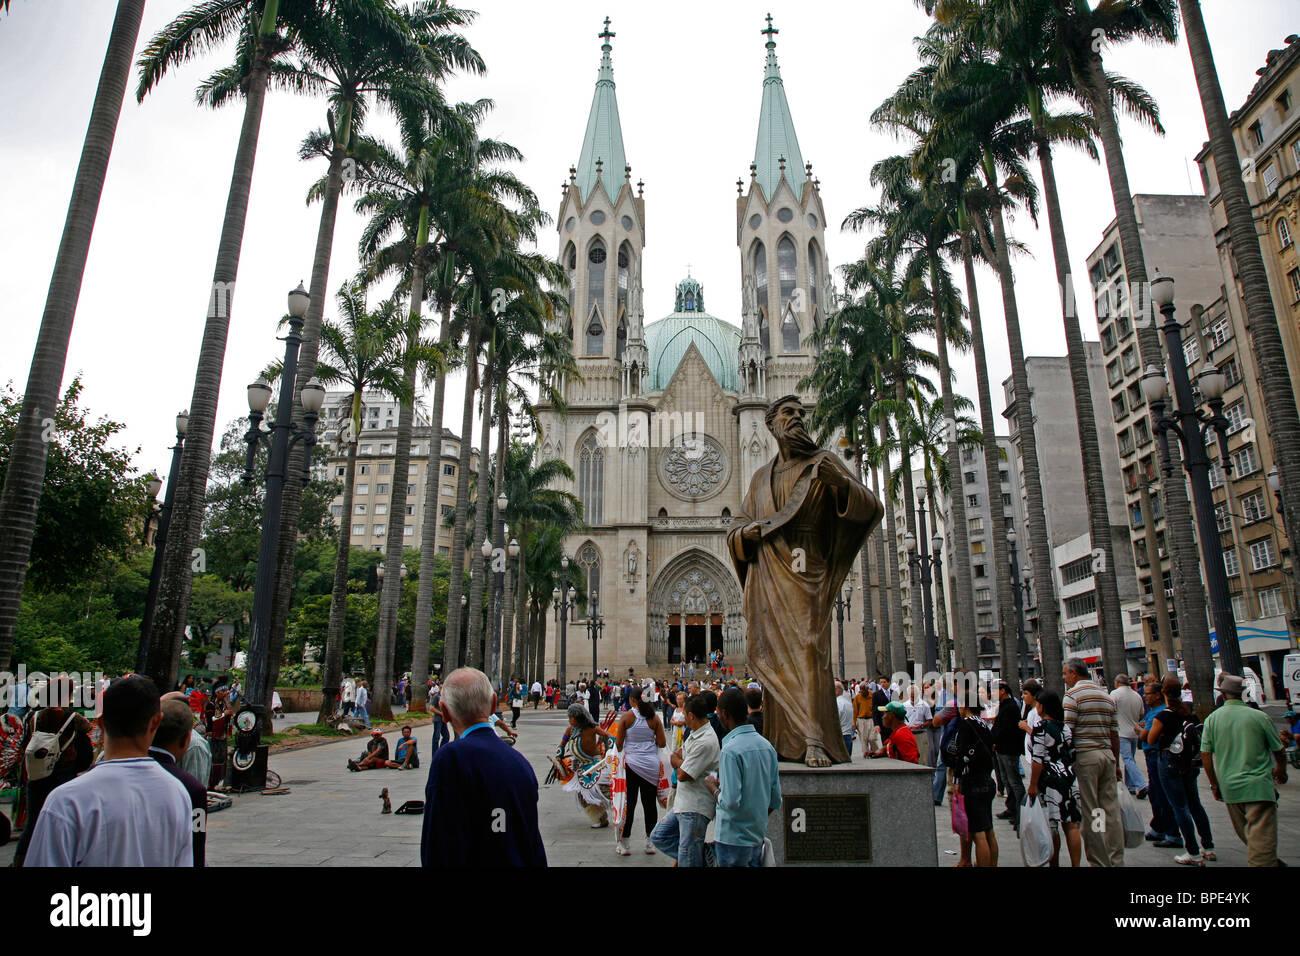 Catedral da Se, Sao Paulo, Brazil. Stock Photo